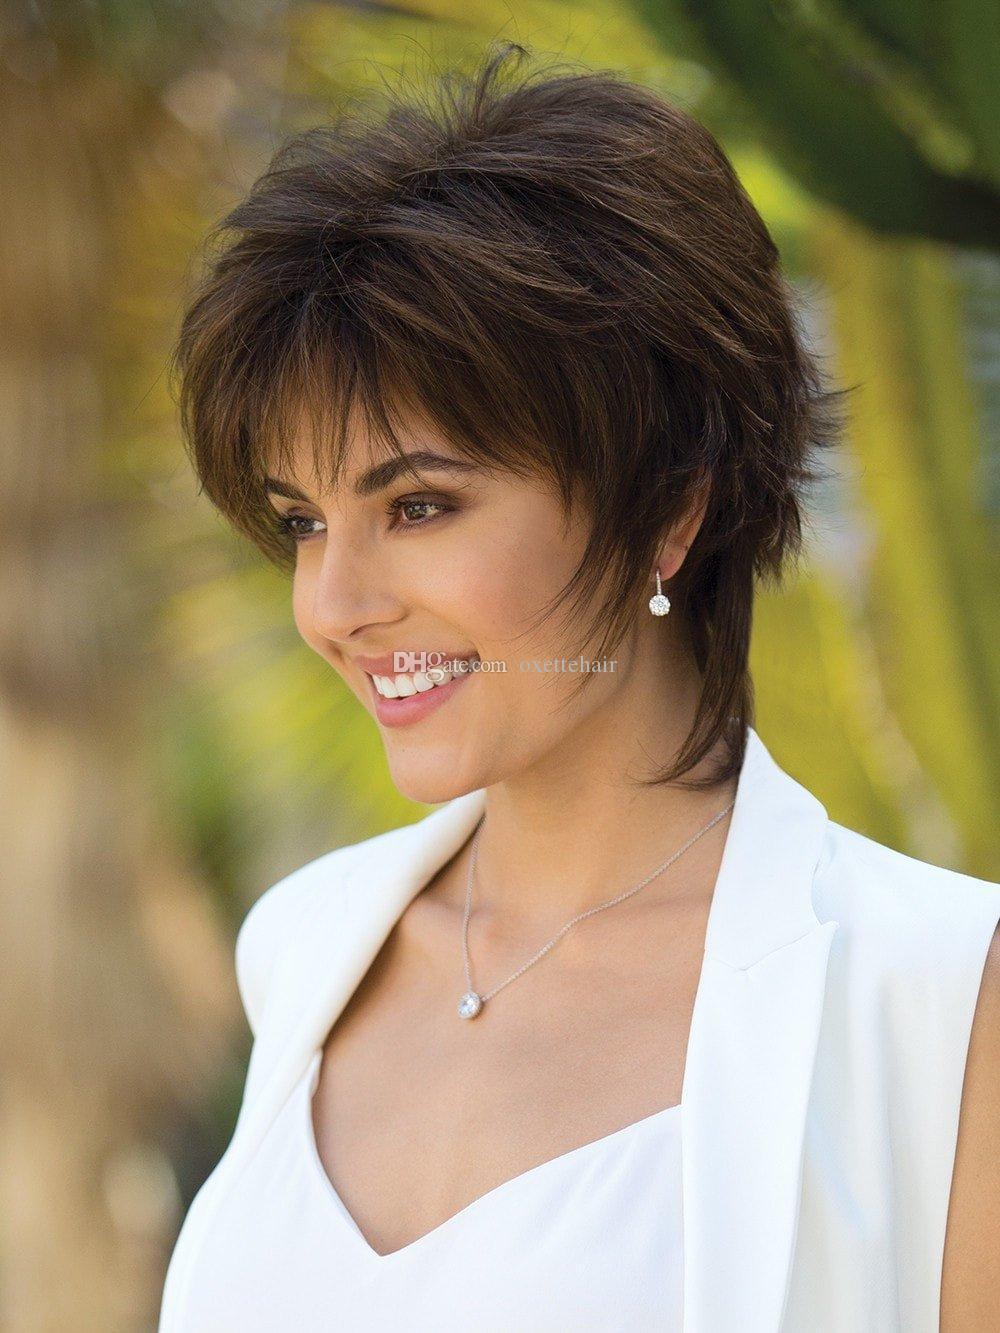 Peluca de pelo ondulado corto de color marrón oscuro con bang Peluca de fibra sintética resistente al calor peluca sin tapa peluca de moda para mujeres